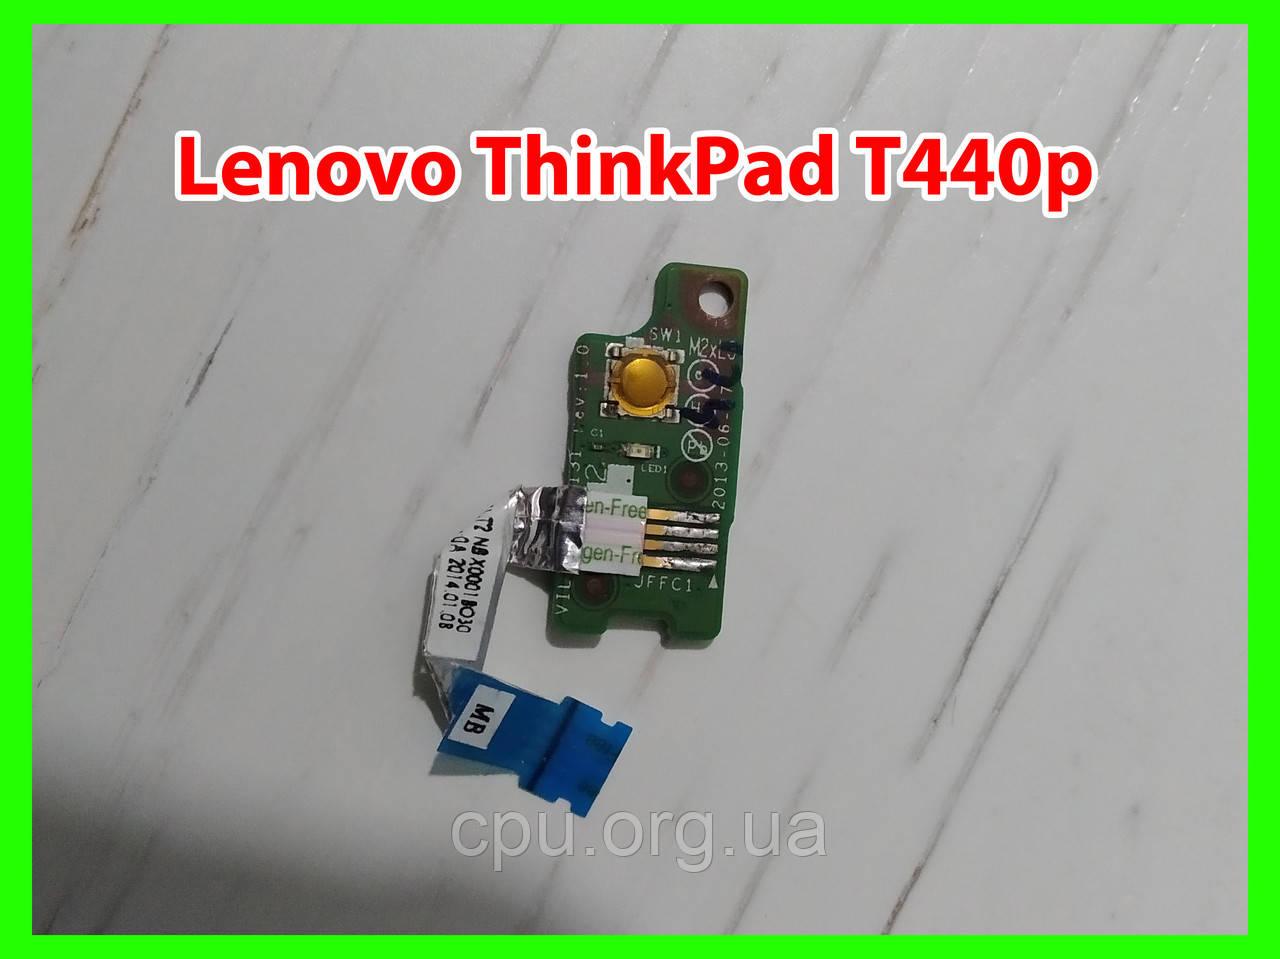 Кнопка включения power button Lenovo ThinkPad T440p